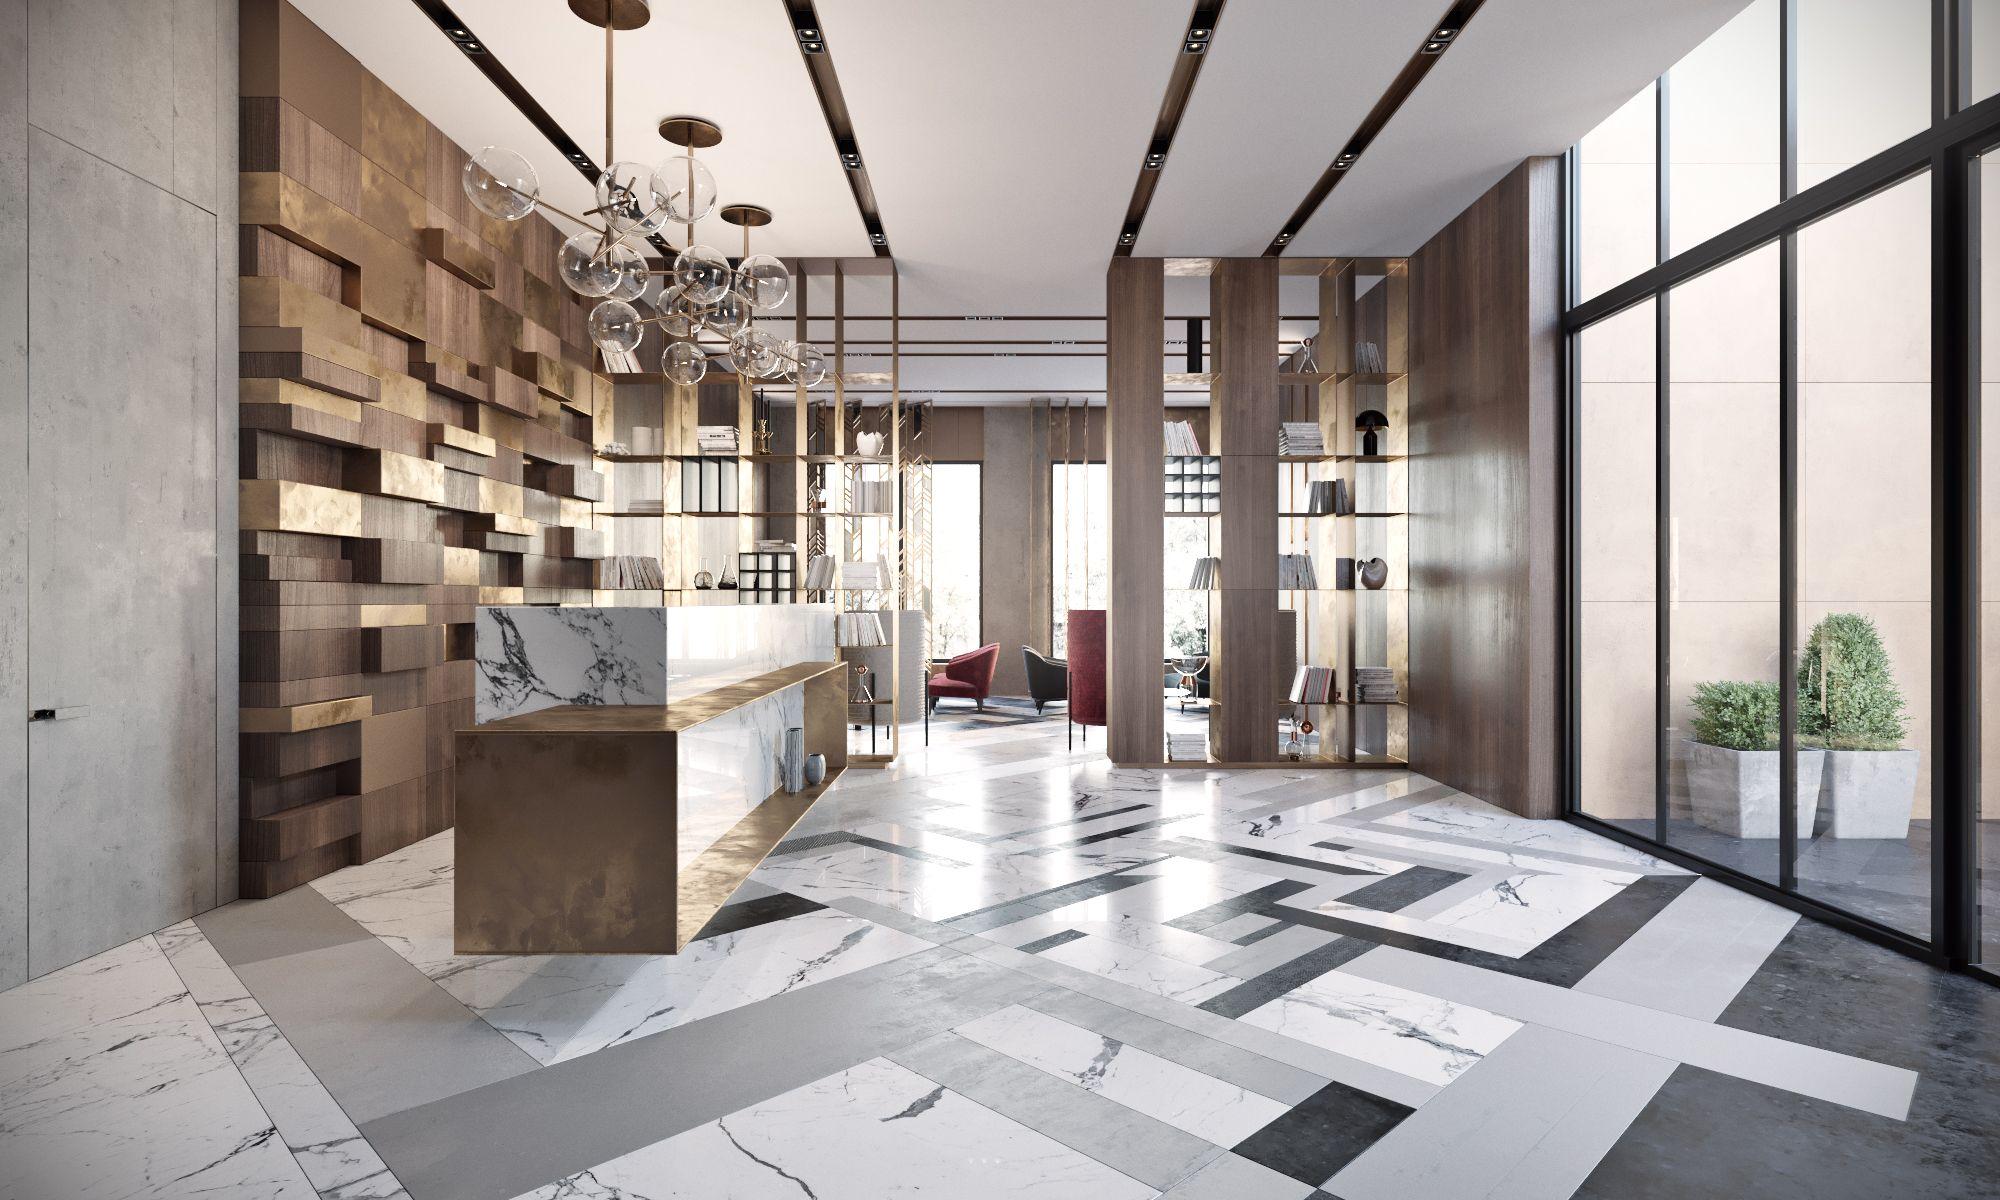 pin von niharika hablani auf interiors pinterest. Black Bedroom Furniture Sets. Home Design Ideas